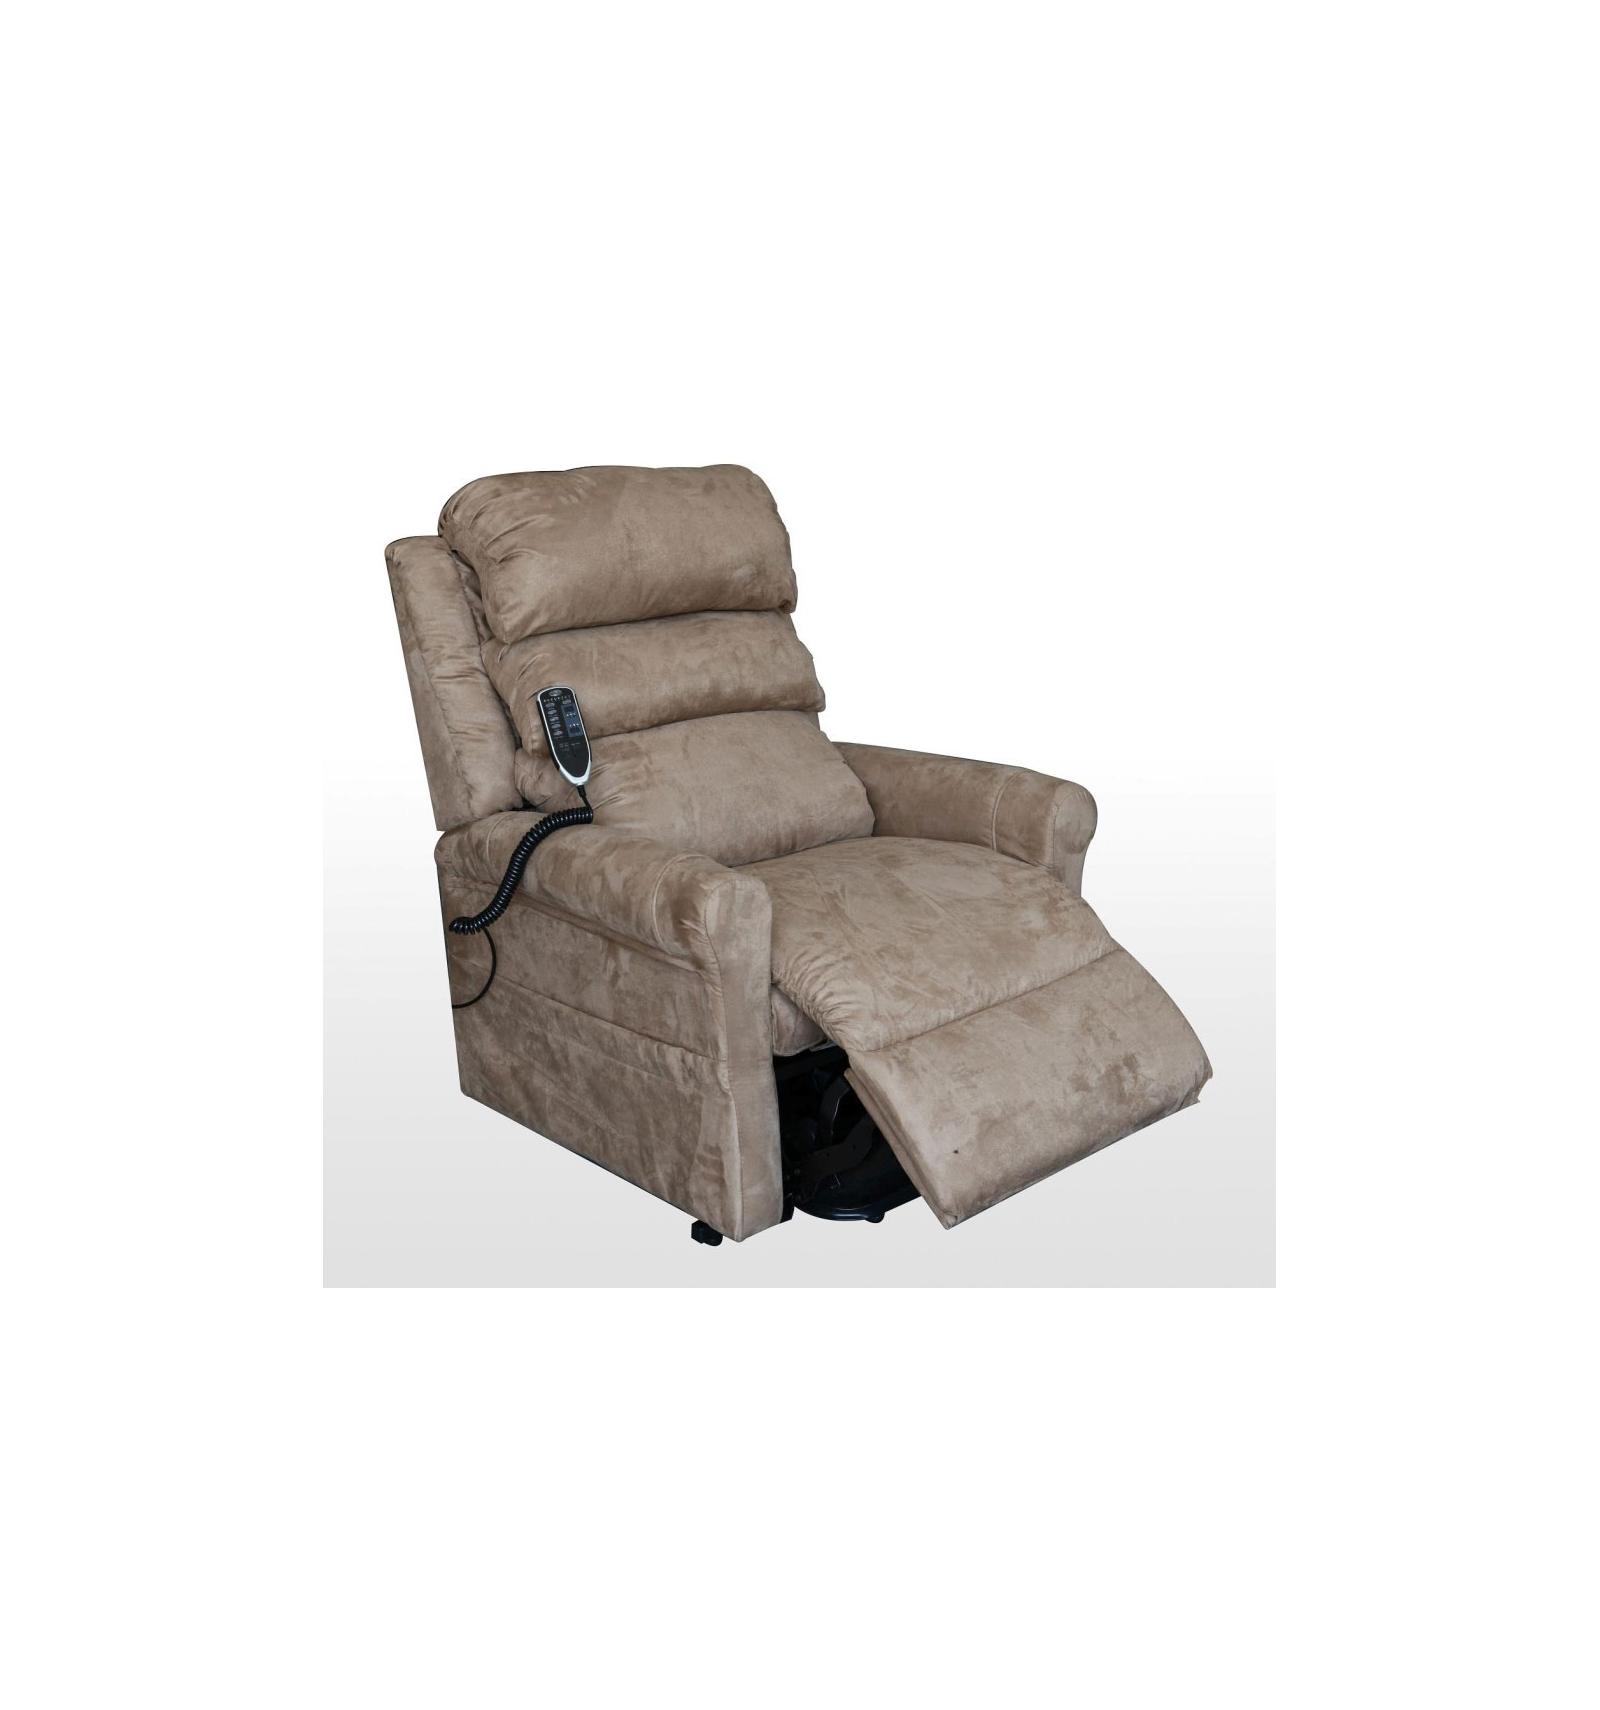 Relax Sessel 2 Motoren Relaxsessel Rv 82 Sessel Polstermöbel Möbel